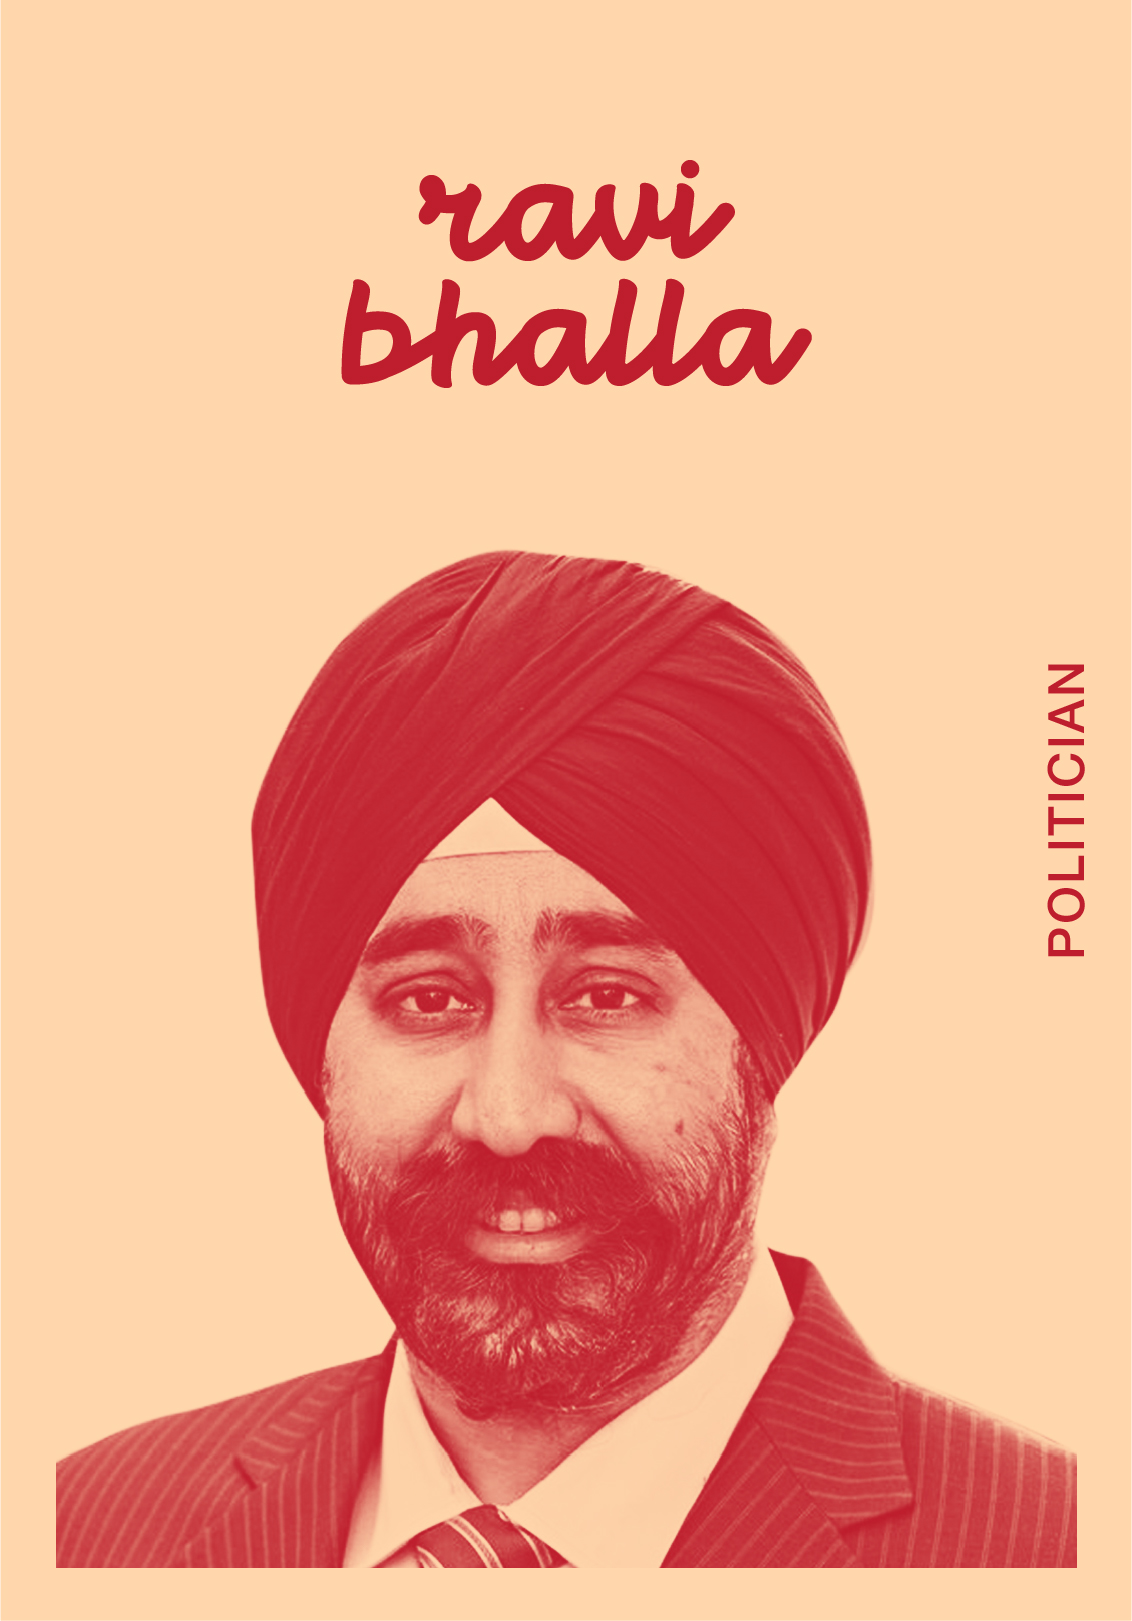 Ravi Bhalla   WEBSITE   @RAVIBHALLA   IG: RAVIFORHOBOKEN